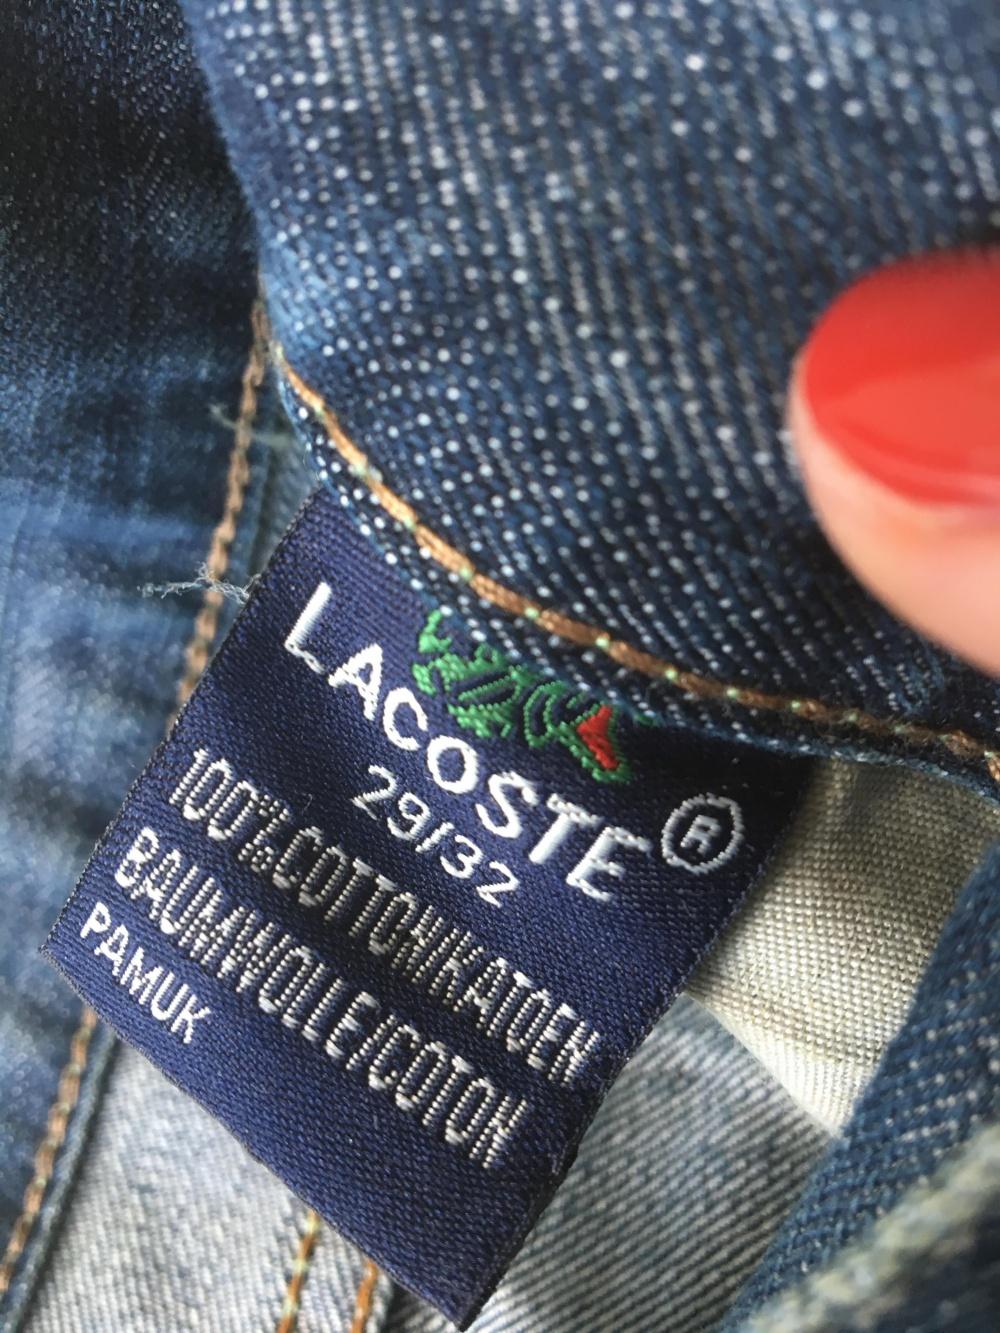 Джинсы Lacoste, размер 42